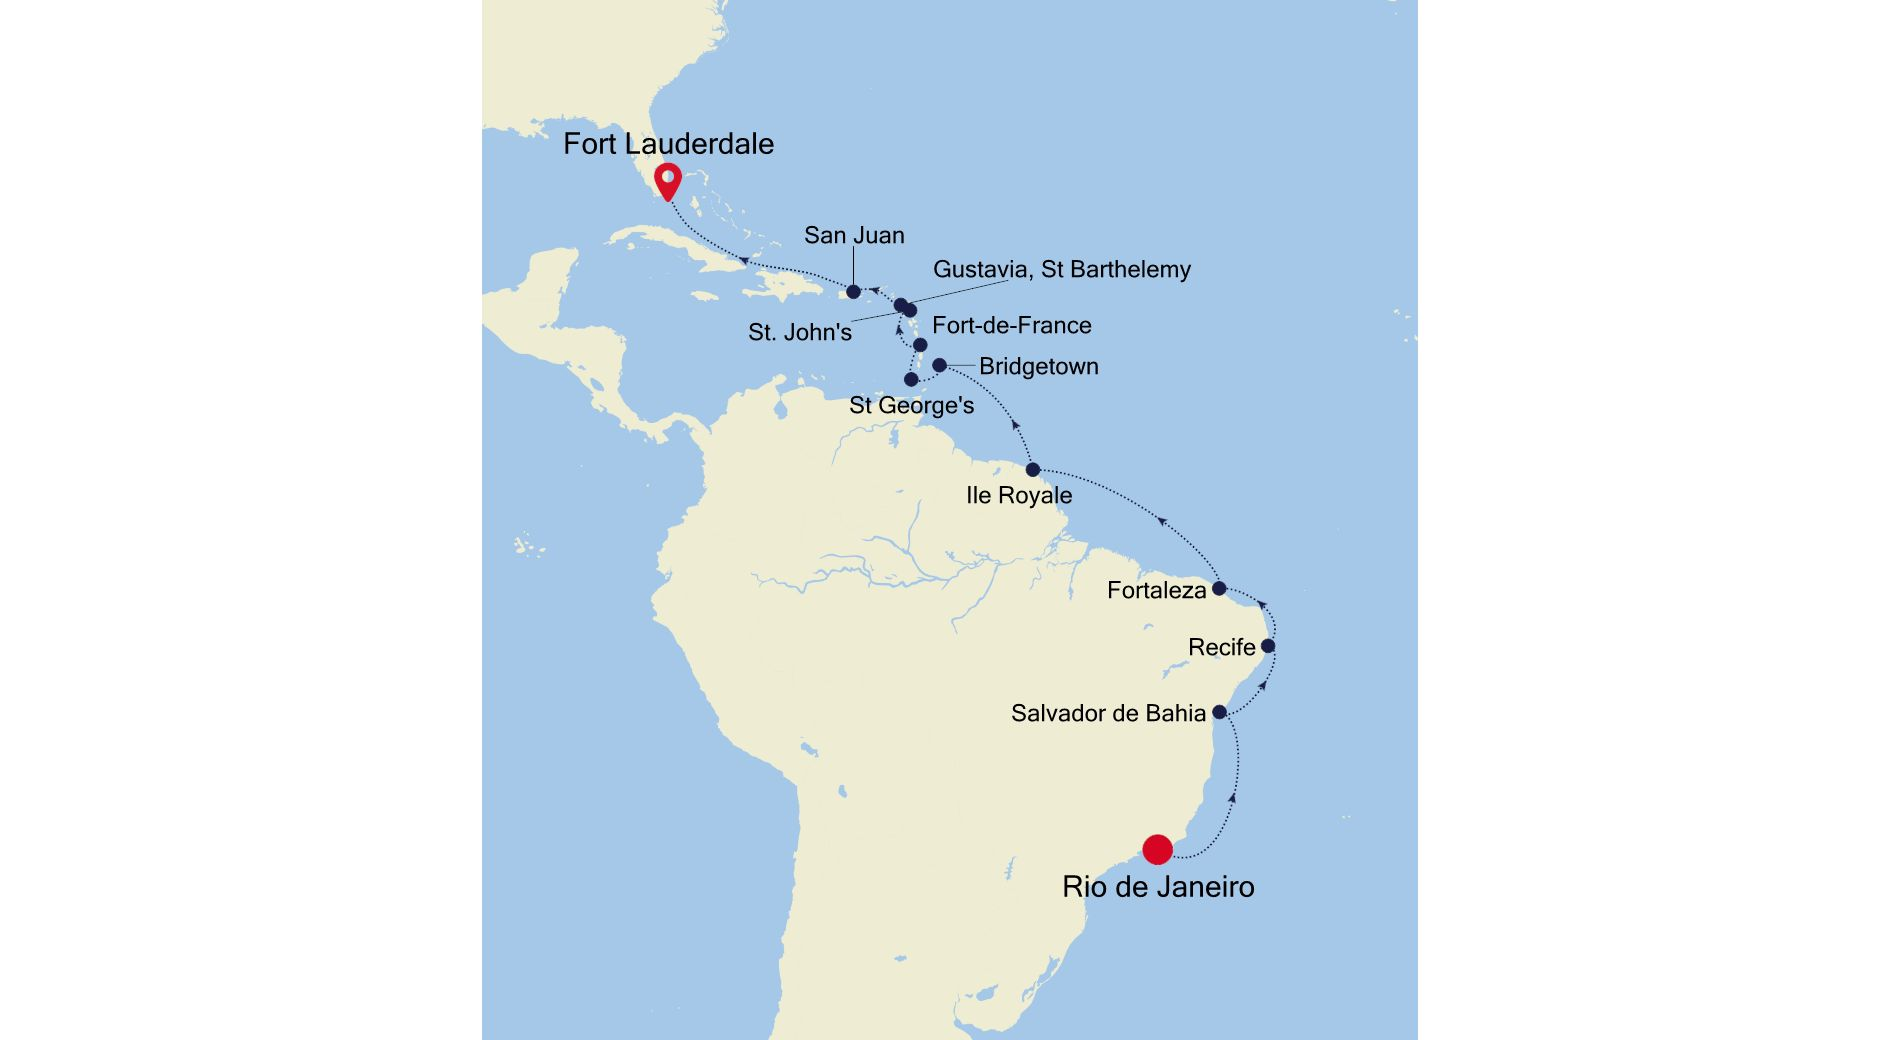 3004 - Rio de Janeiro nach Fort Lauderdale